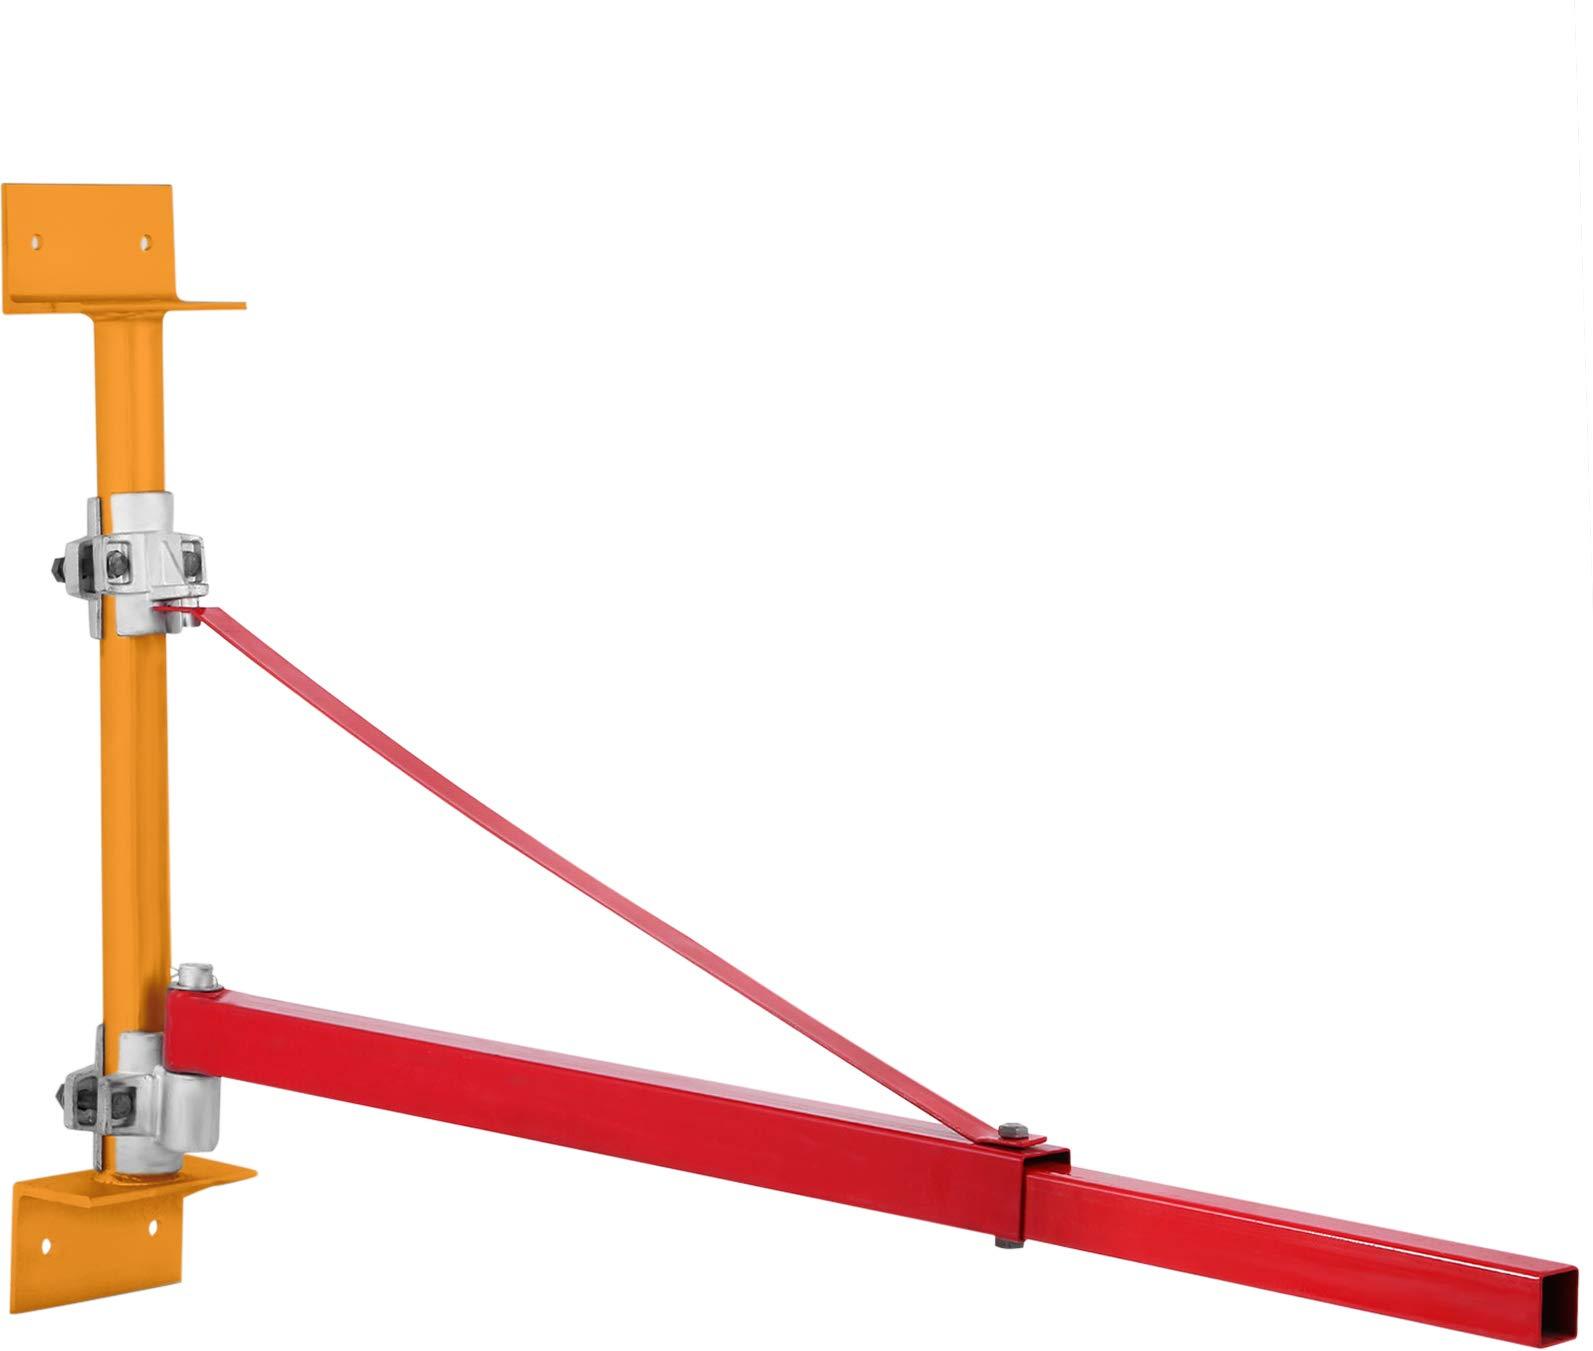 FORAVER Scaffold Electric Hoist Swing Arm 300~600kg Swing Arm Scaffolding Pole Electric Hoist Arm